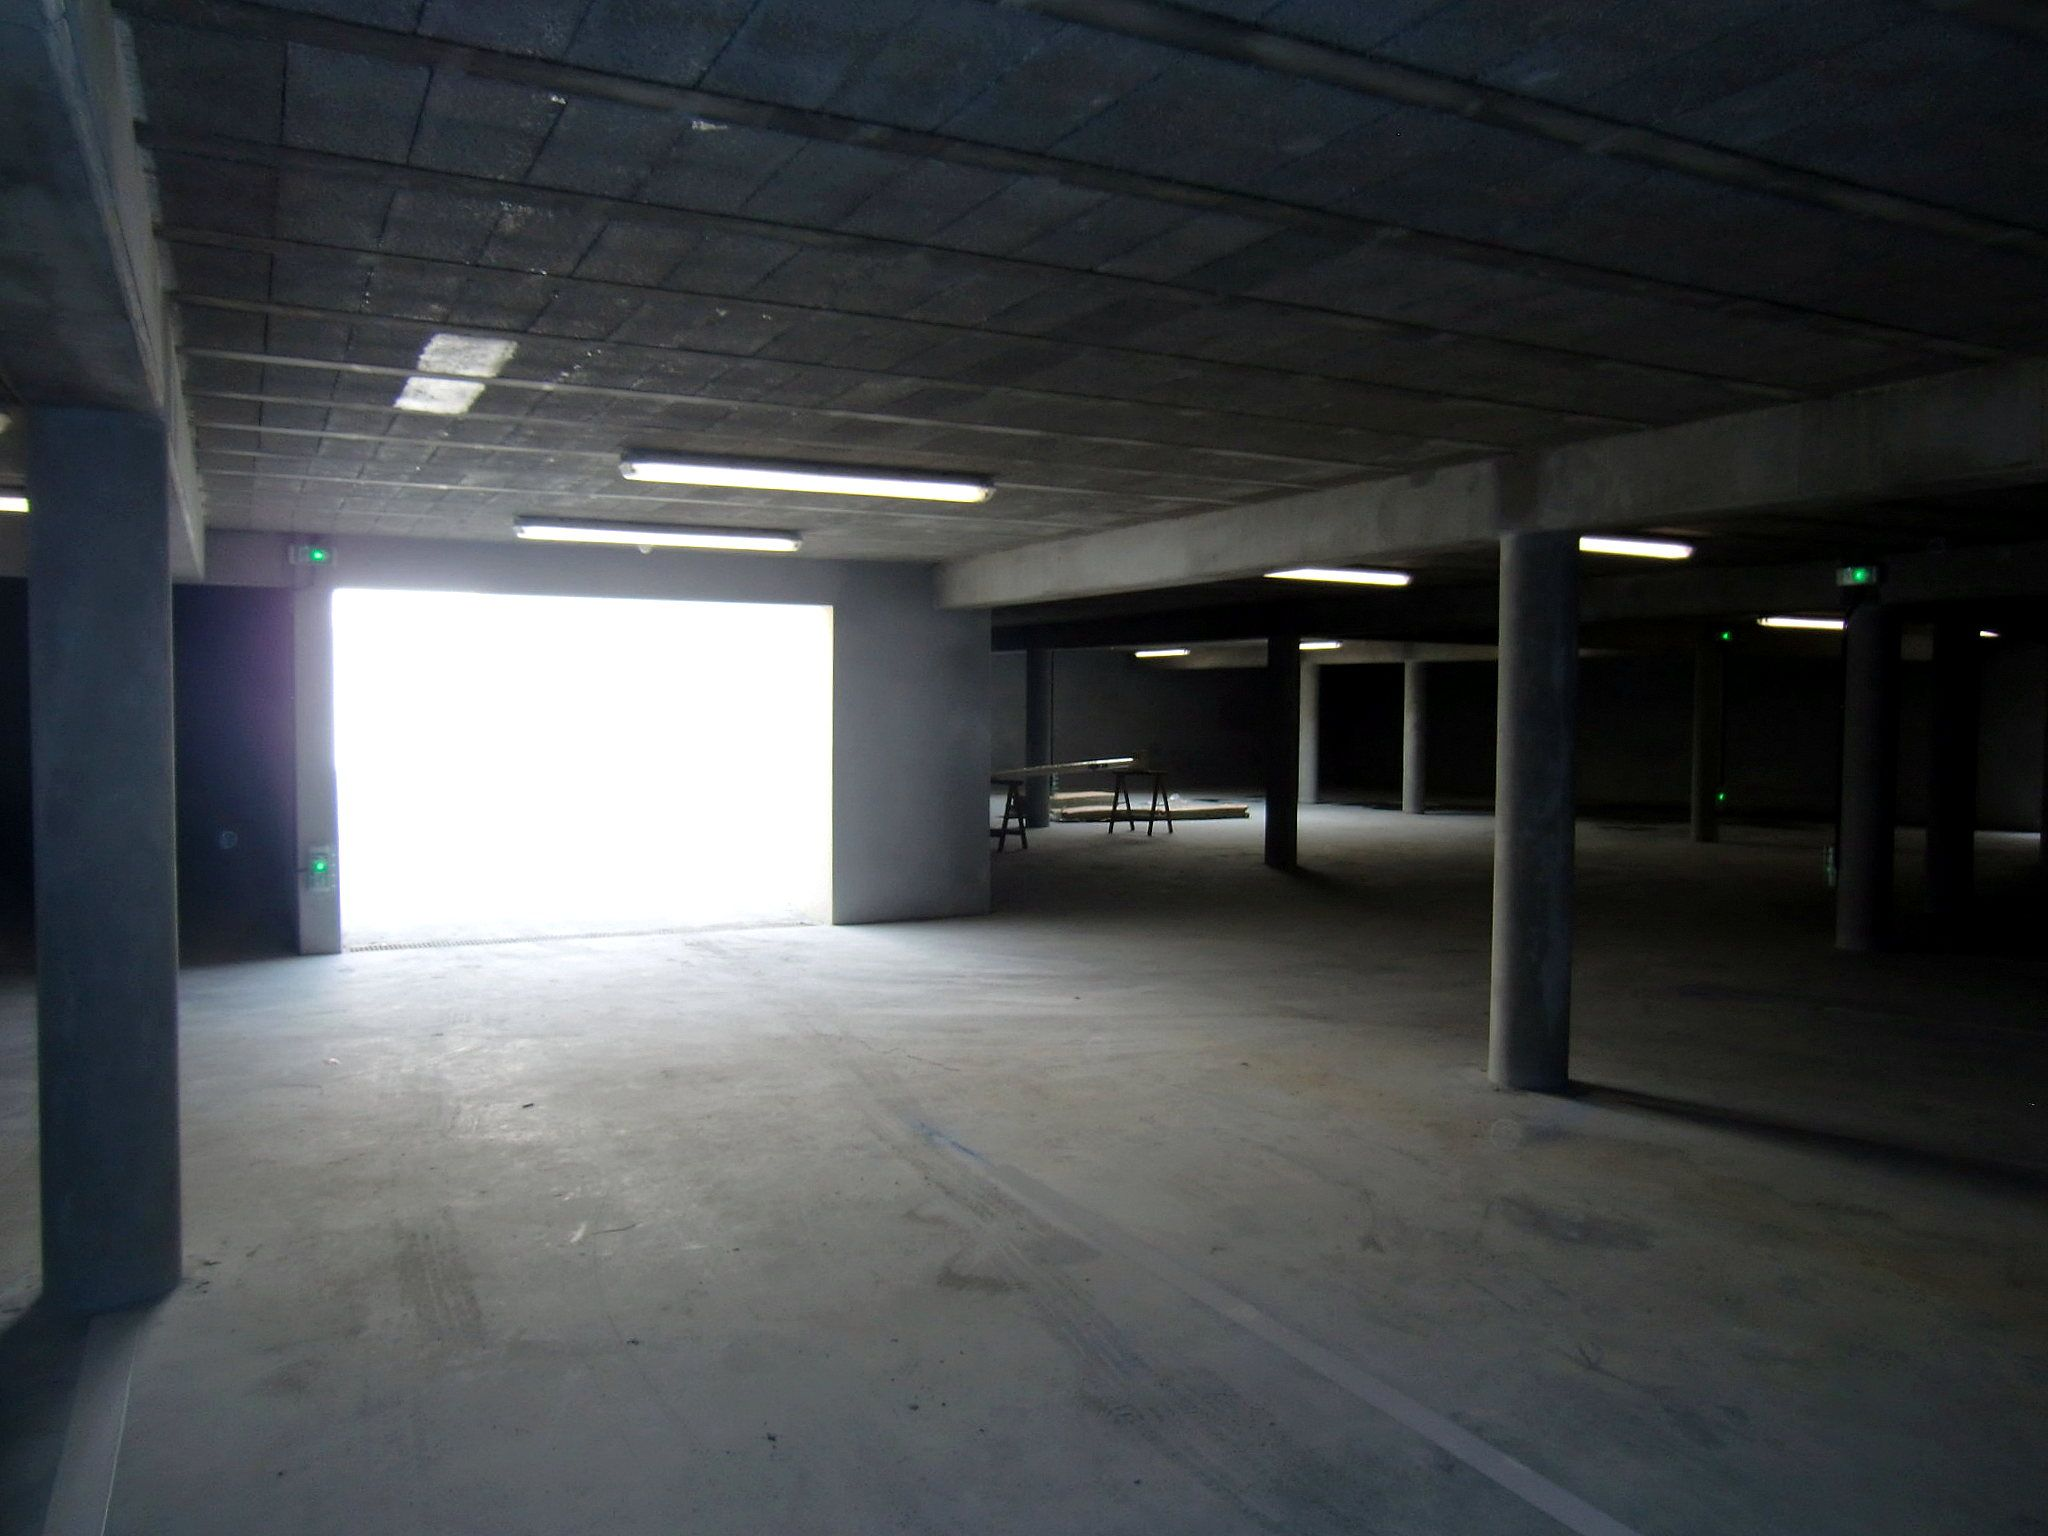 parking souterrain r sidence henri dunant angoul me pinterest r sidence henri et terre. Black Bedroom Furniture Sets. Home Design Ideas